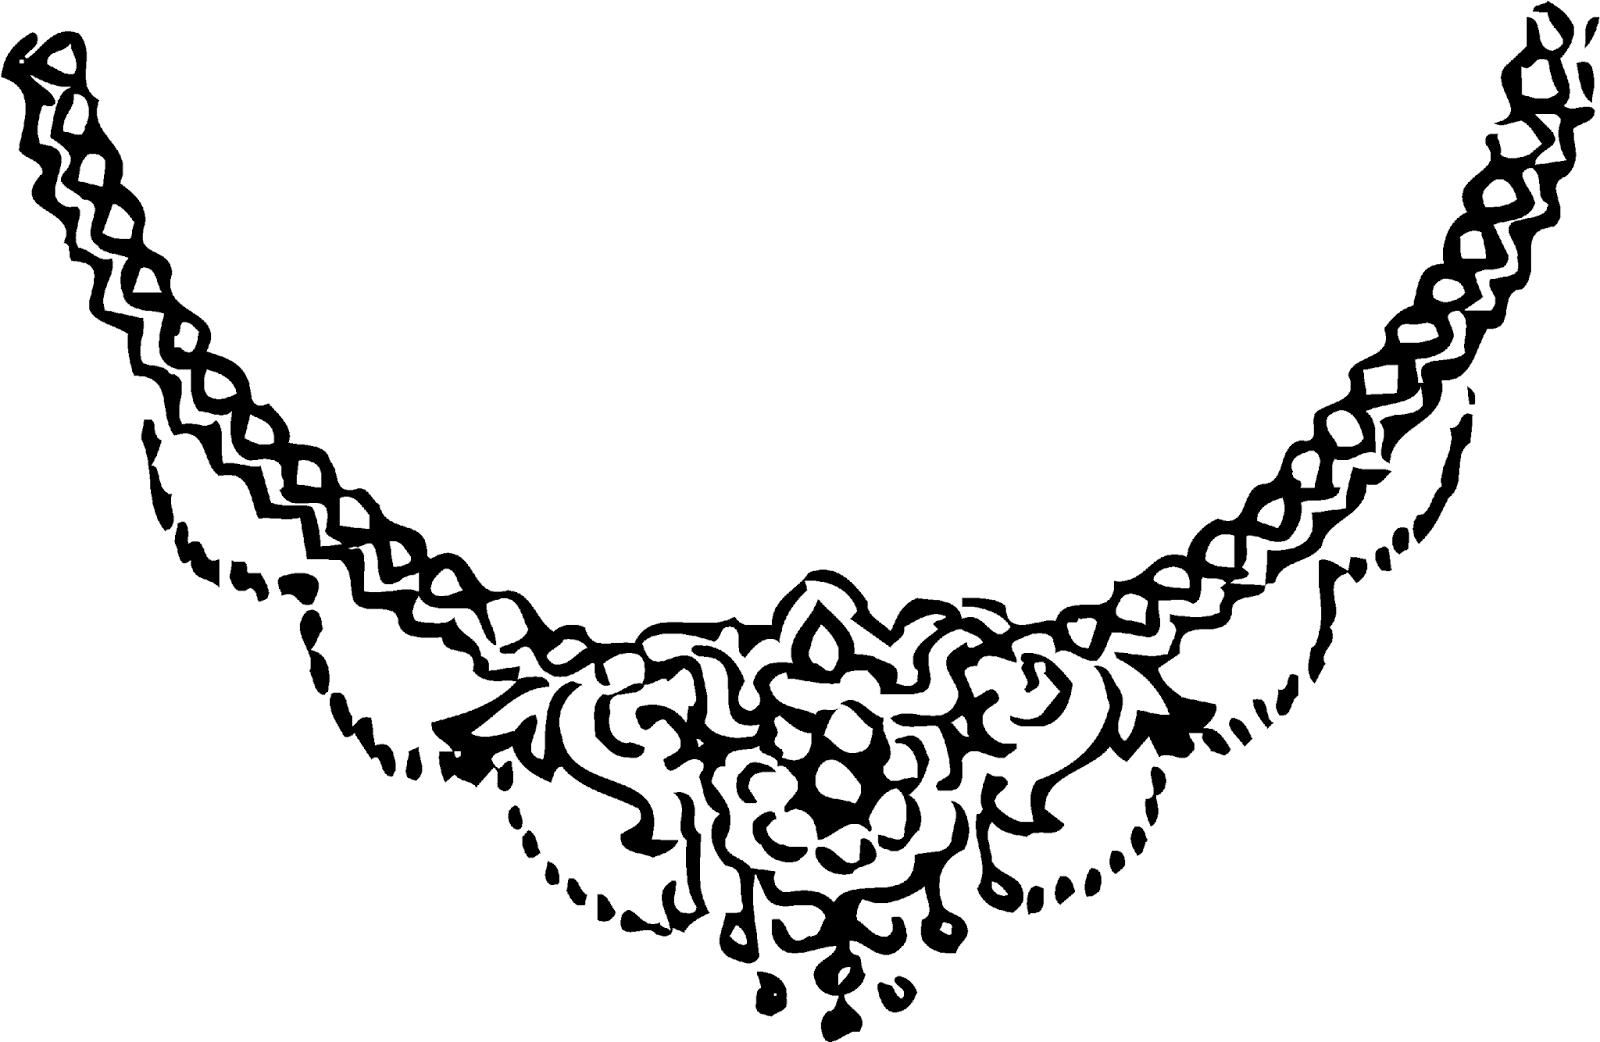 jewellery clipart : jewellery clipart 4.